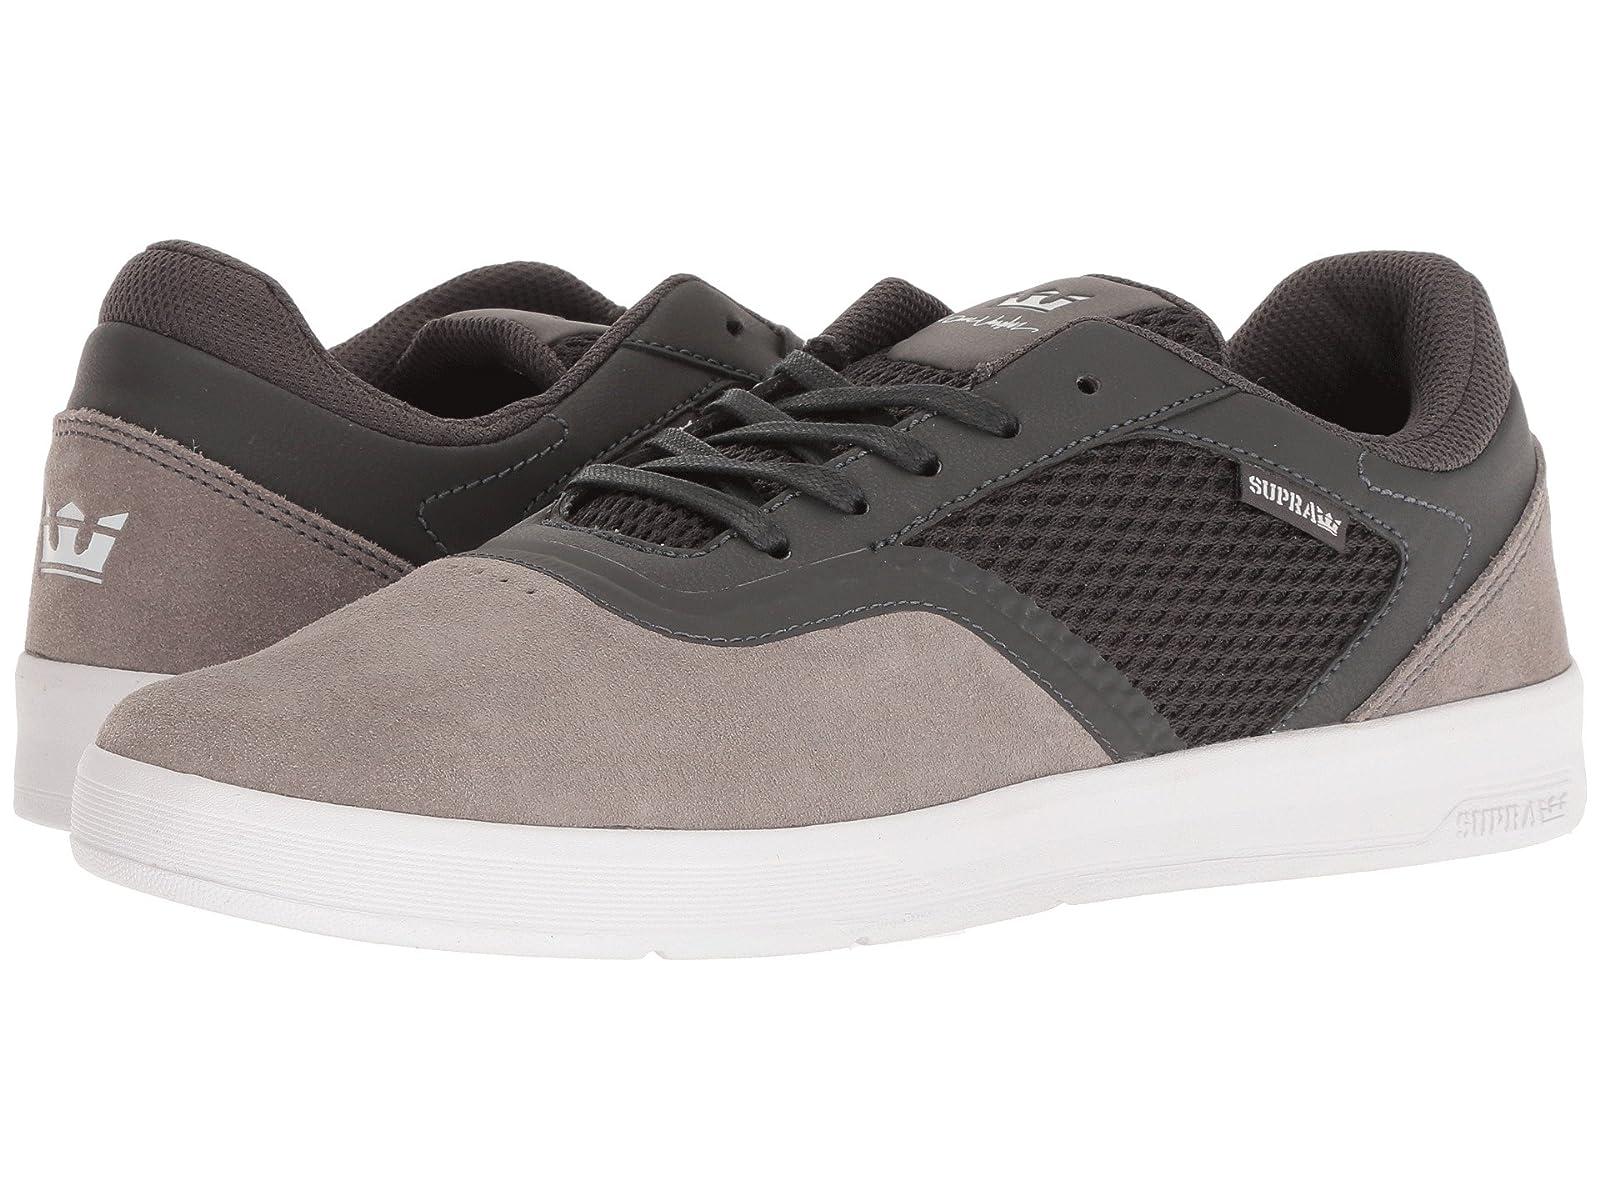 Supra SaintAtmospheric grades have affordable shoes